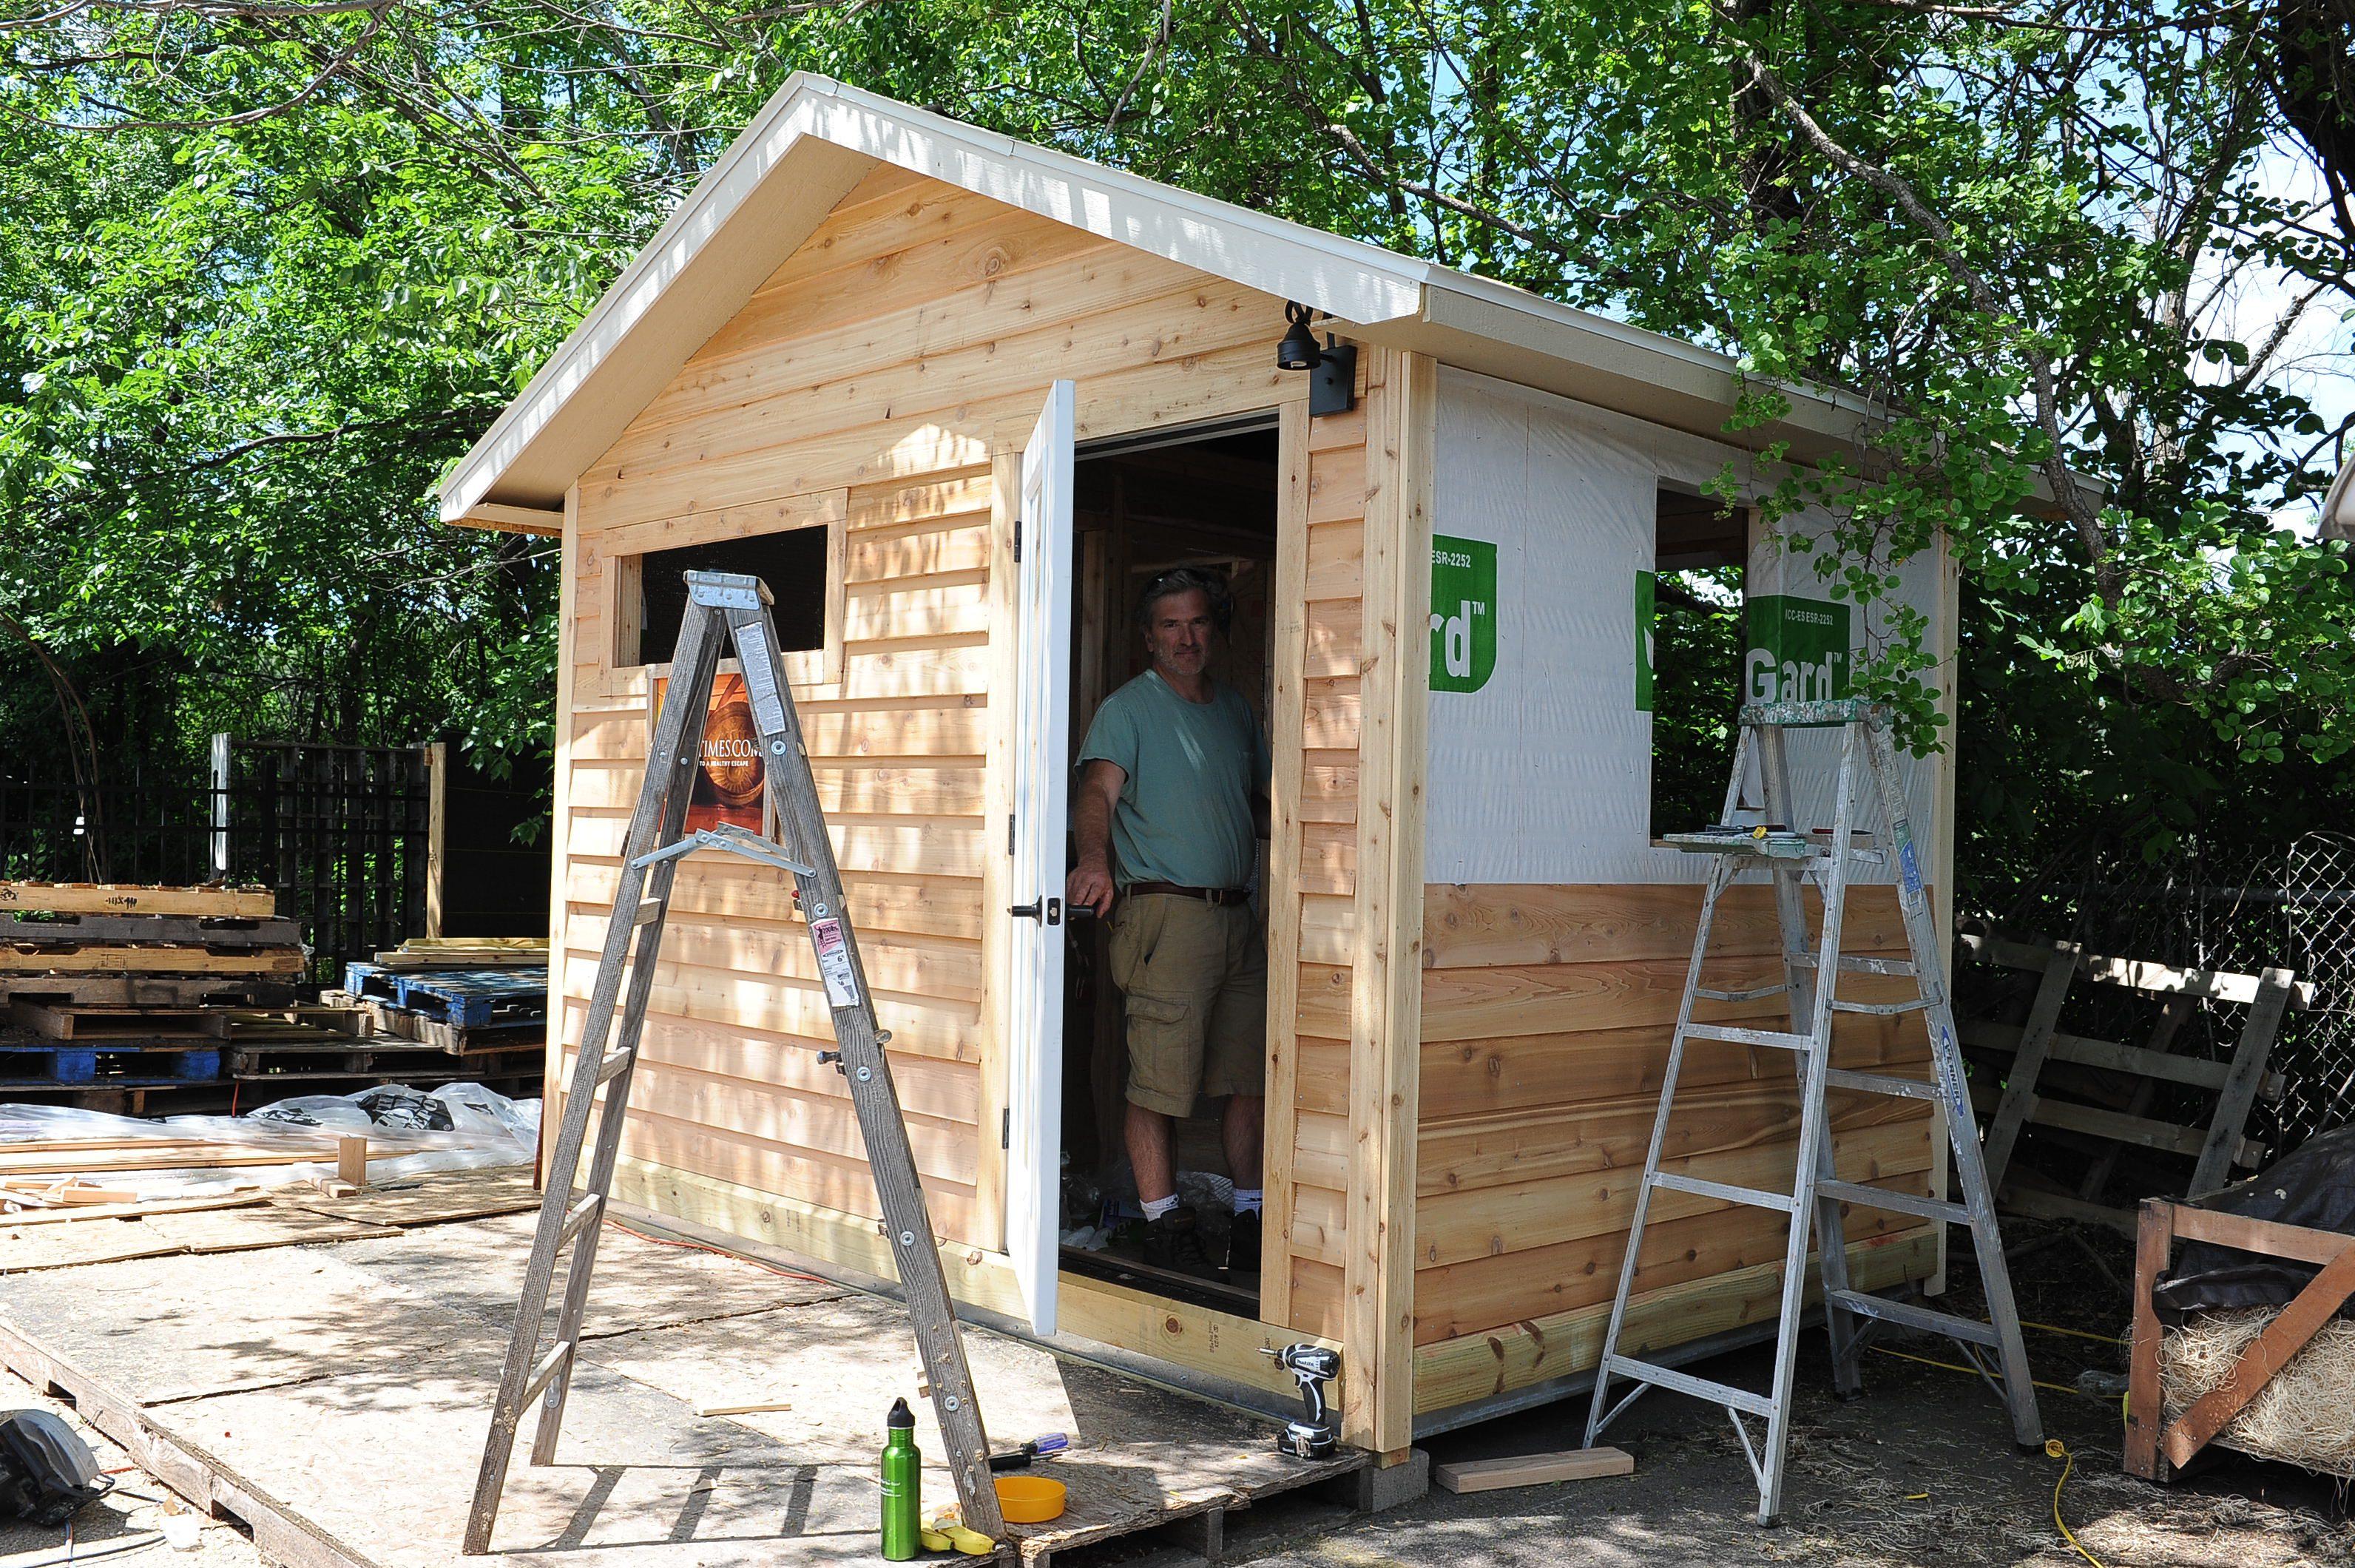 cedar lap siding just may be the exterior bomb saunatimes. Black Bedroom Furniture Sets. Home Design Ideas